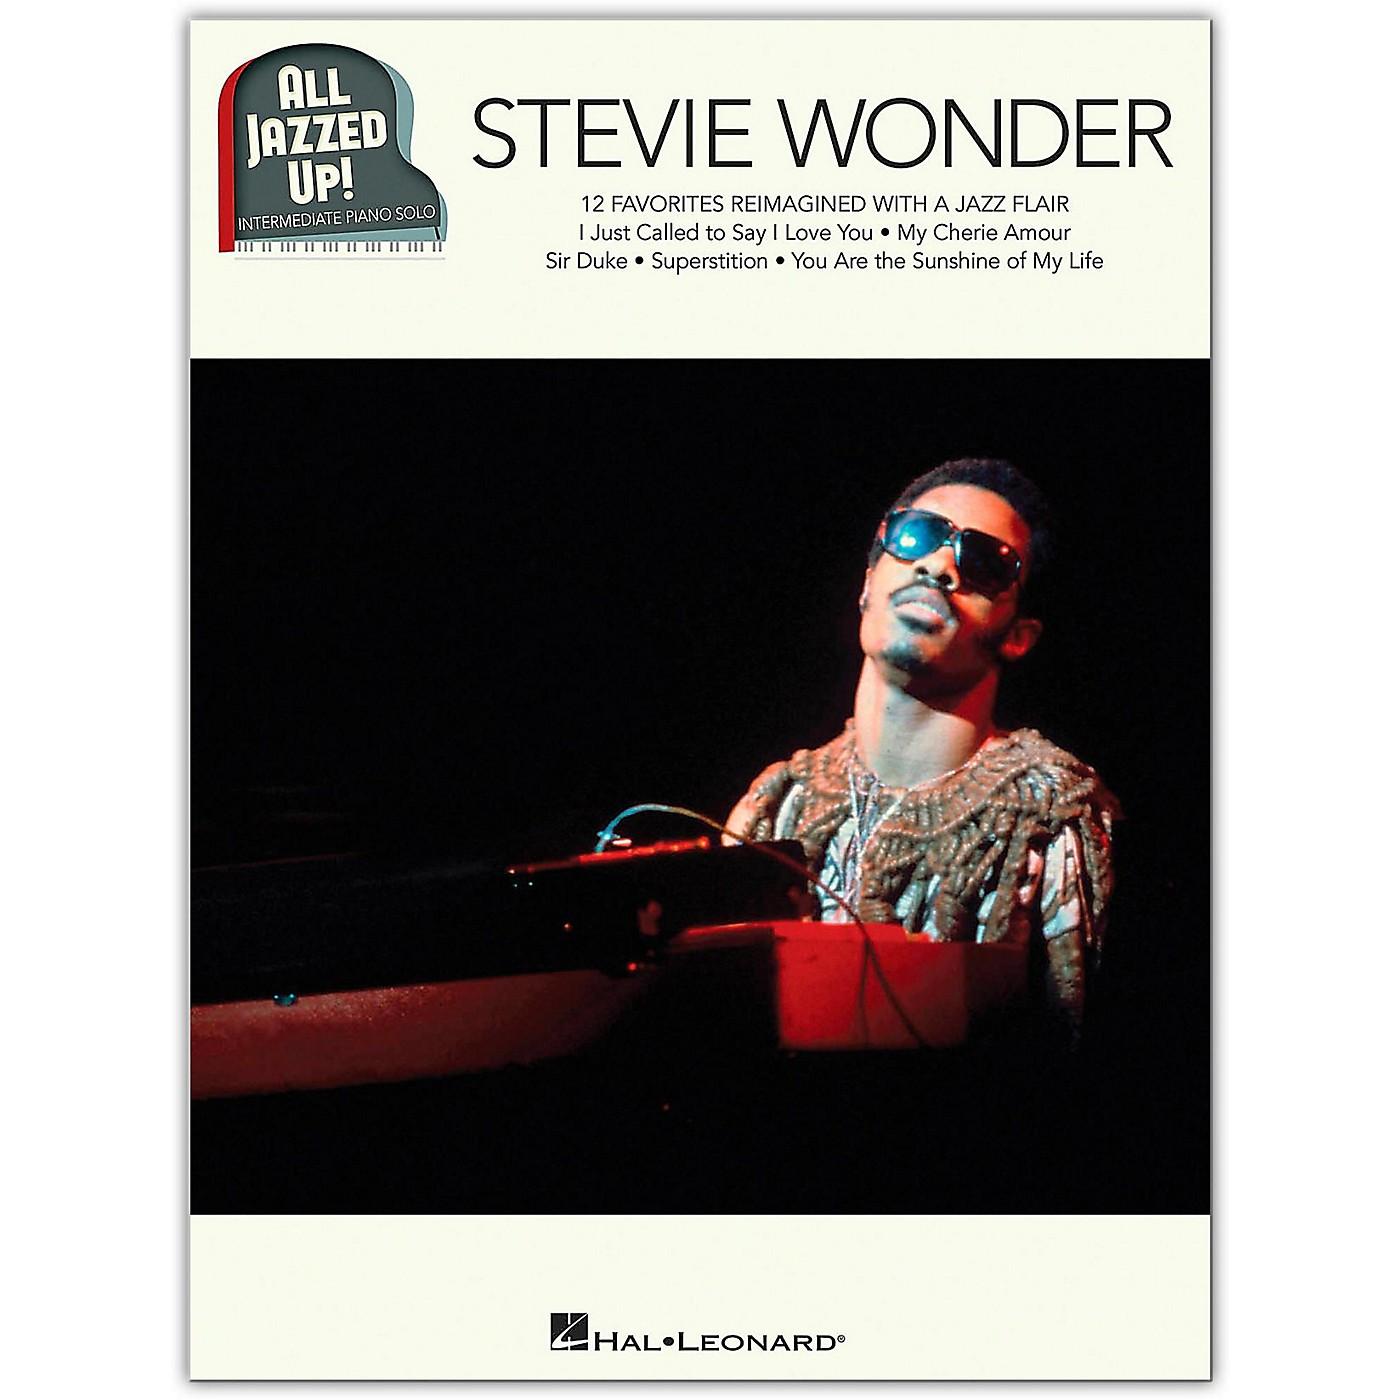 Hal Leonard Stevie Wonder - All Jazzed Up!  Intermediate Piano Solo Songbook thumbnail